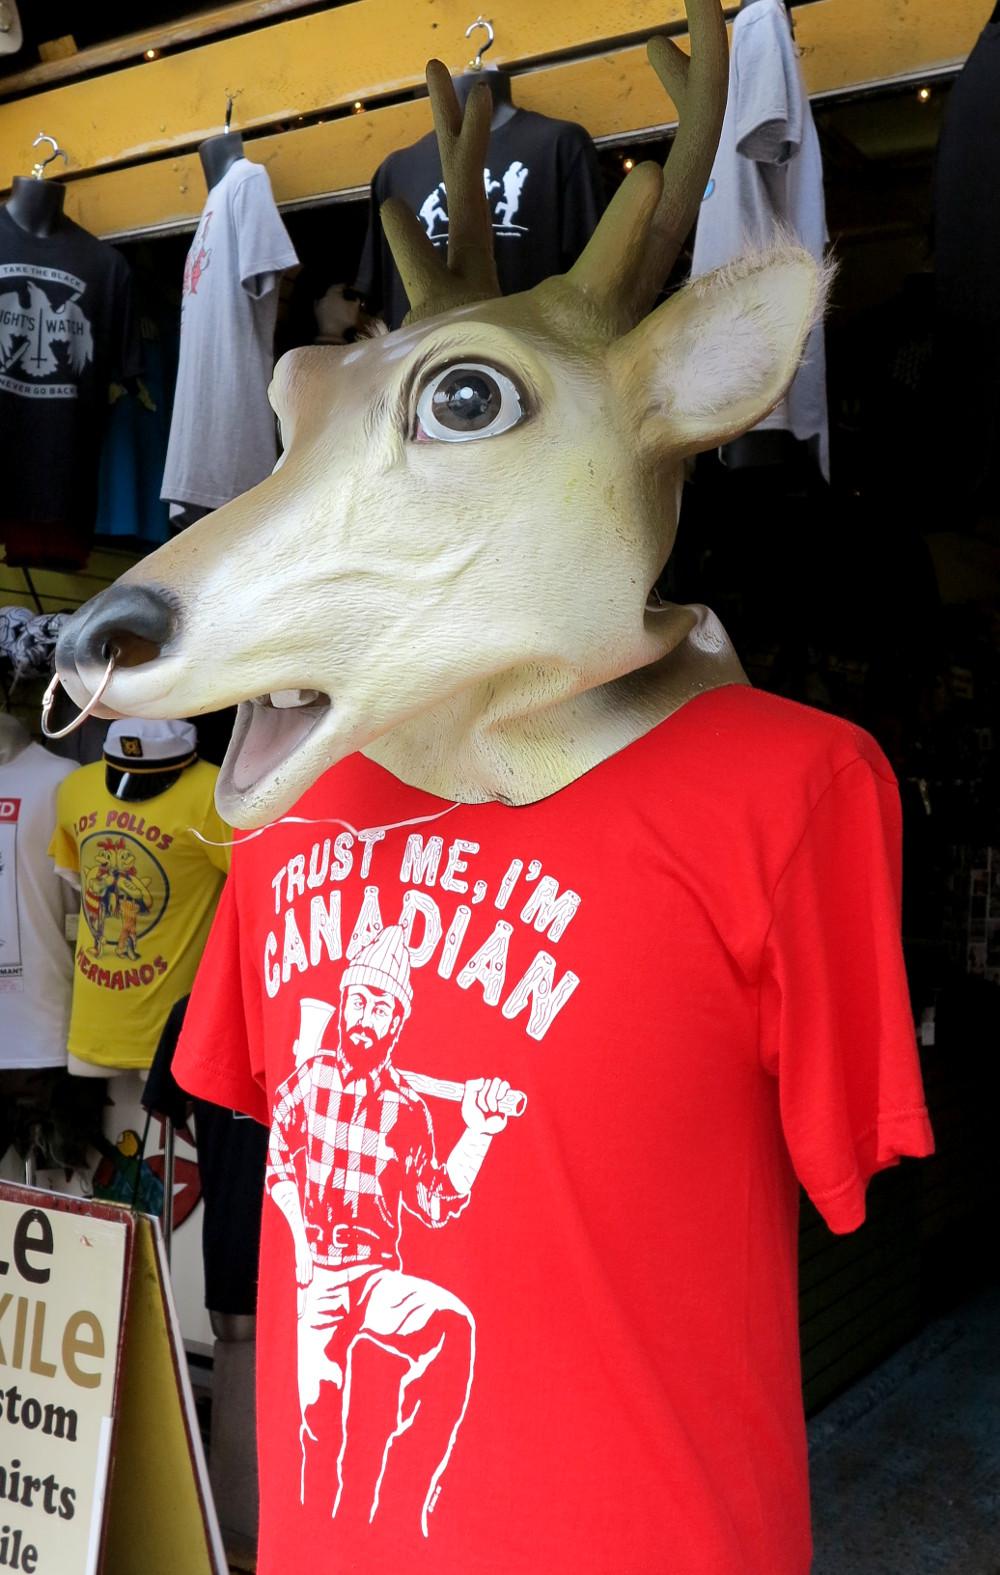 t shirt humour in Kensington Market Double-Barrelled Travel